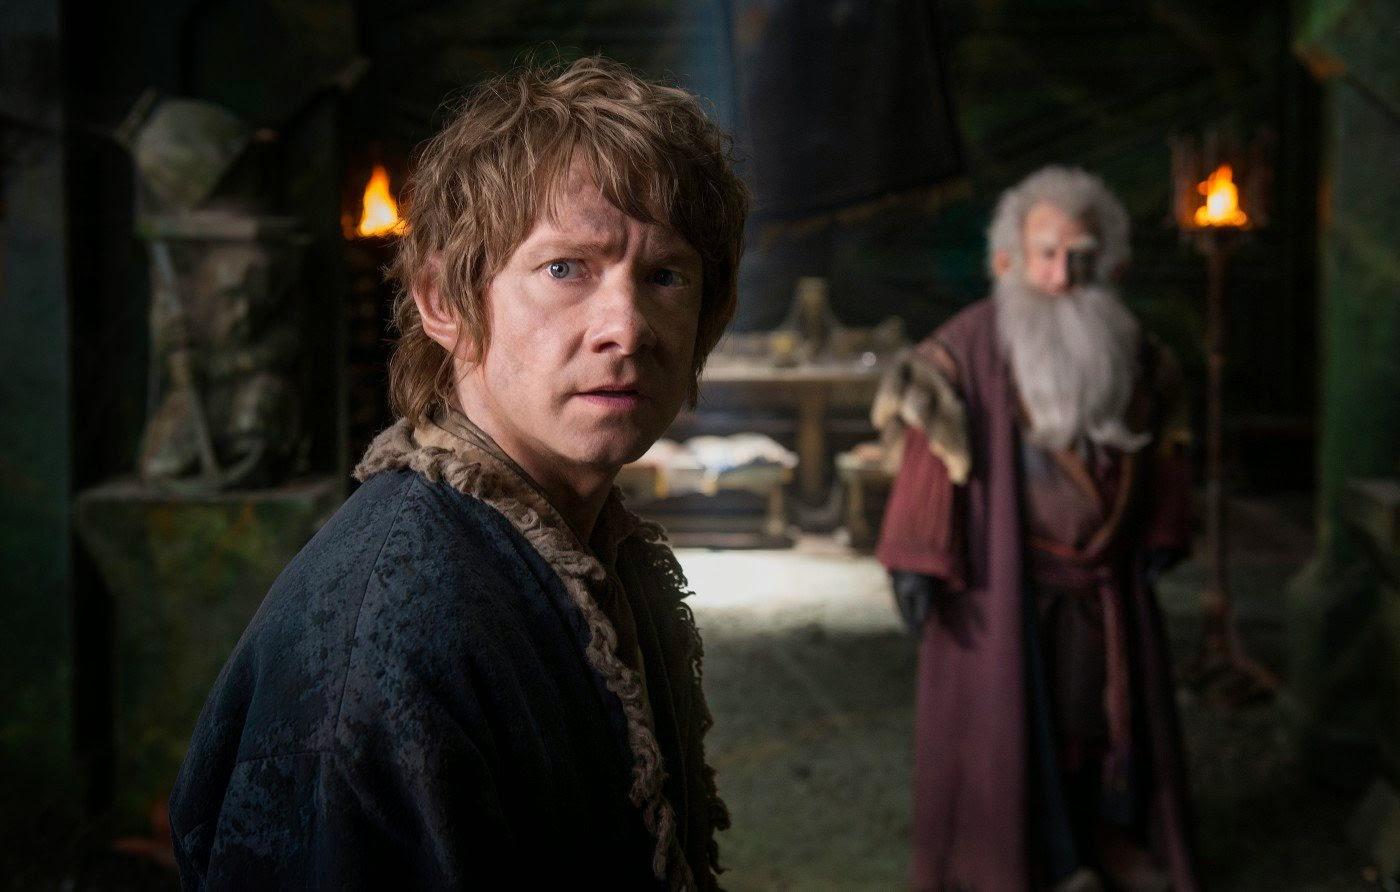 Martin Freeman and Ken Stott in The Hobbit: The Battle of the Five Armies